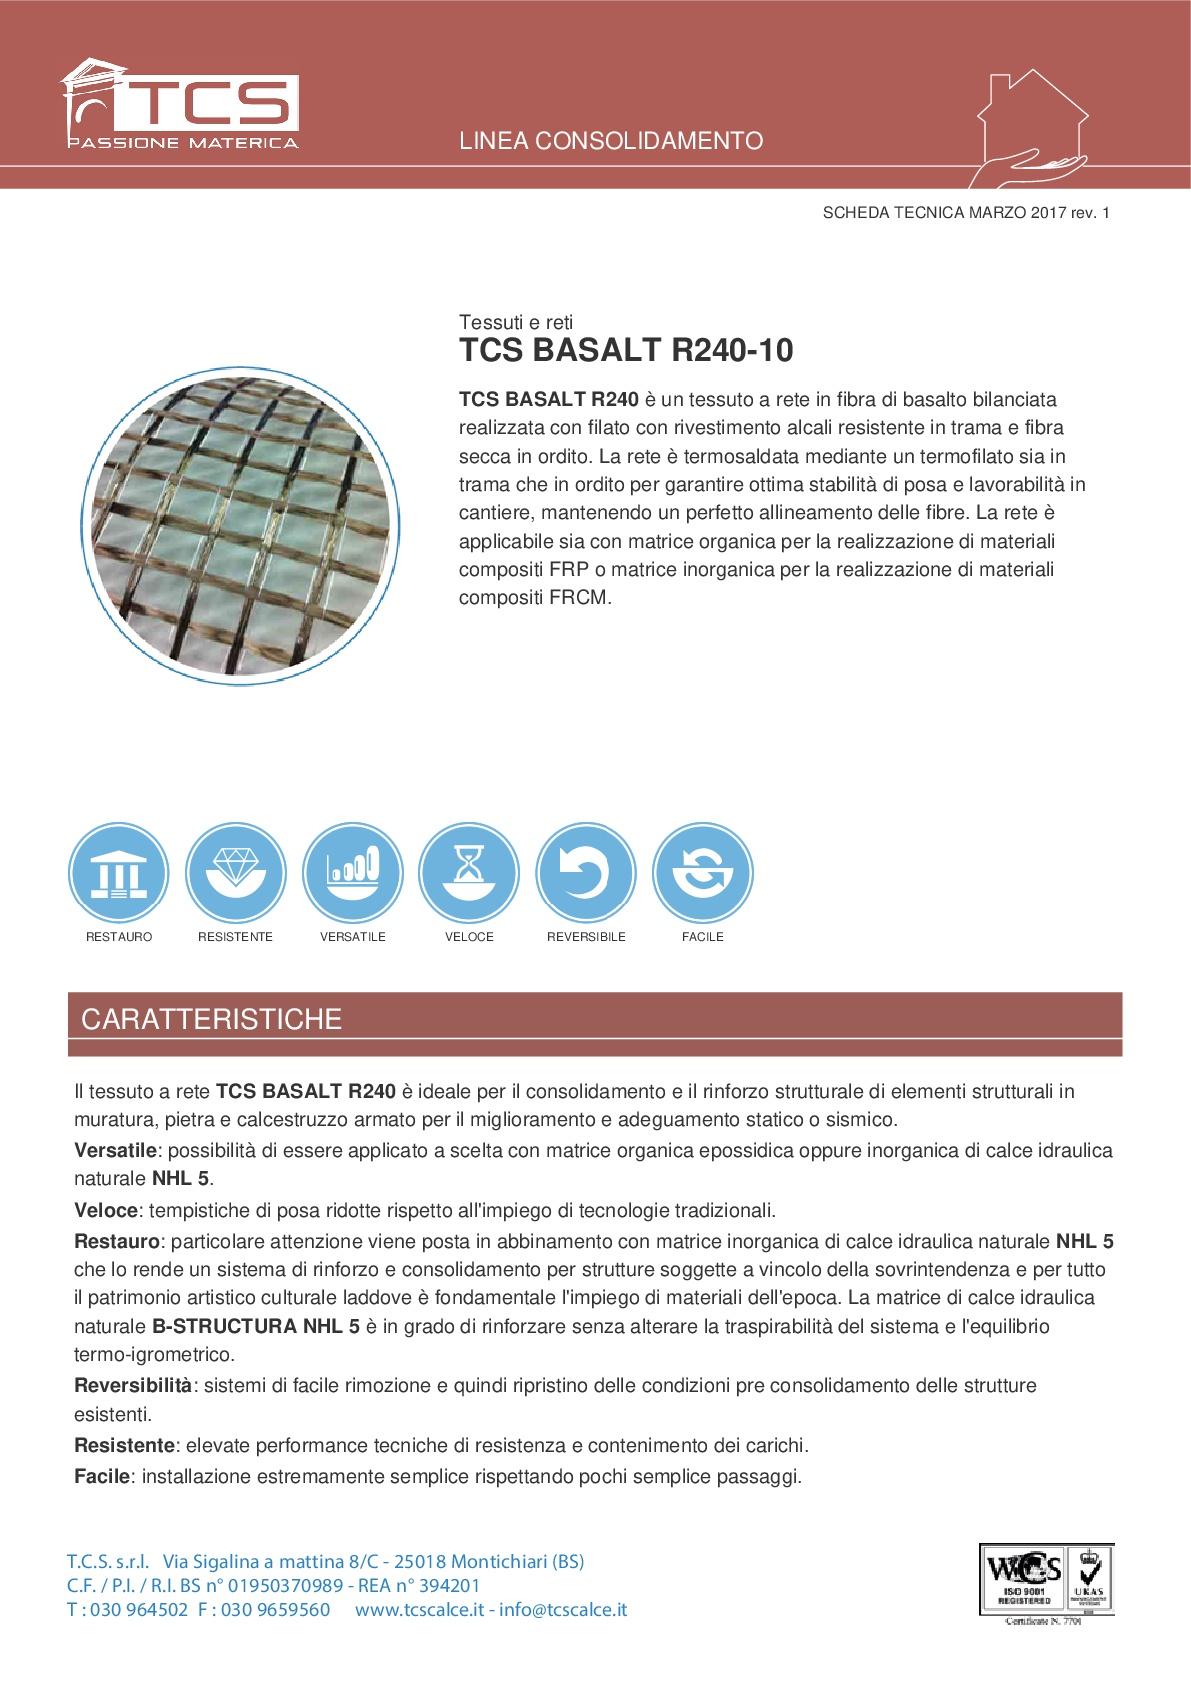 TCS BASALT R240-10